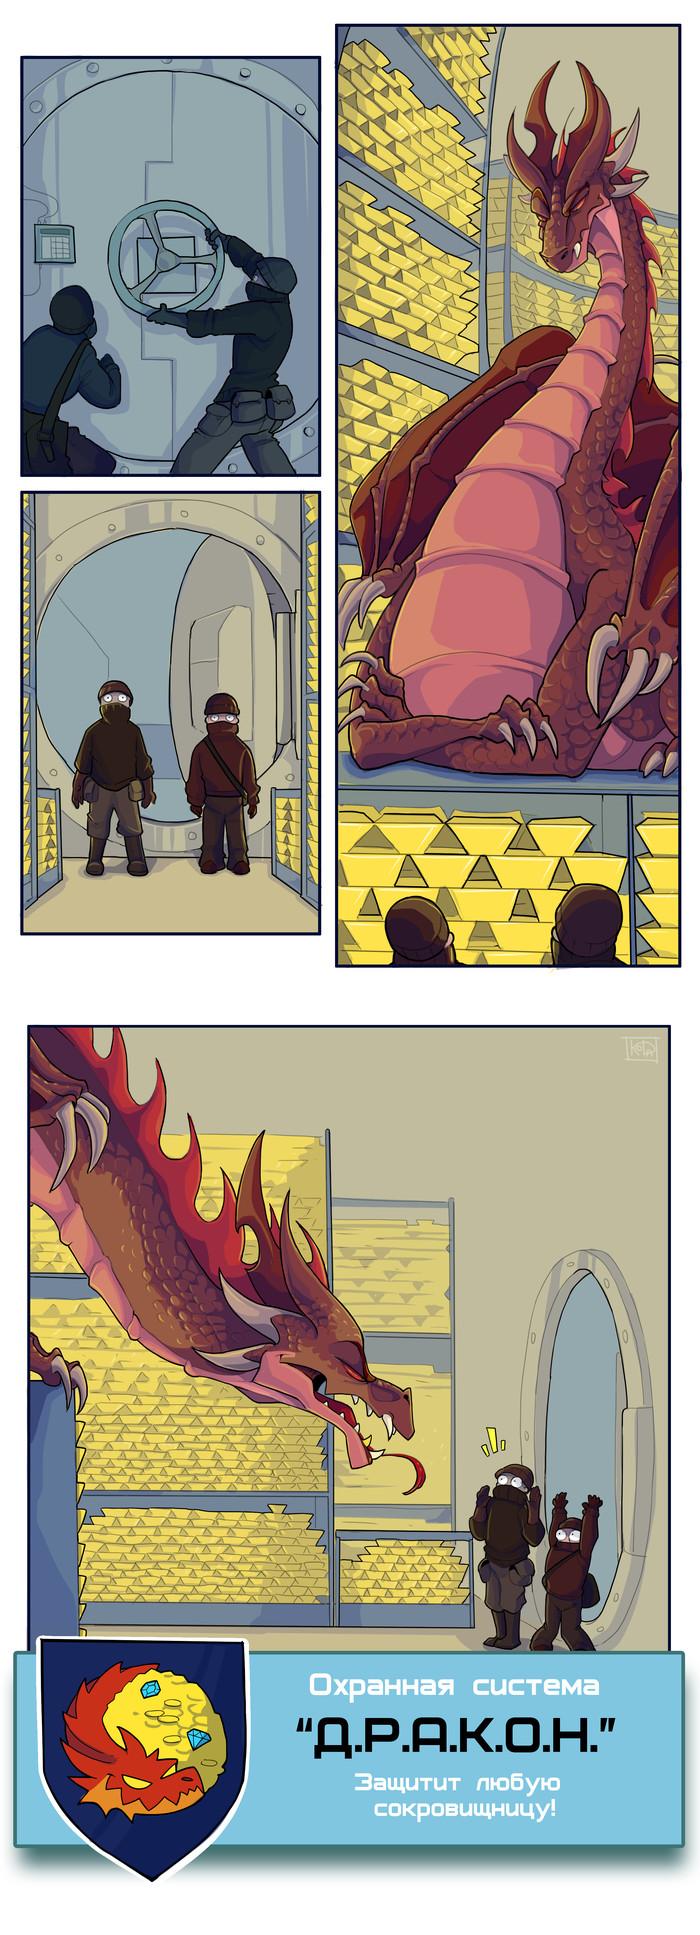 Хранилище. KoDa, Комиксы, Дракон, Хранилище, Сейф, Золото, Длиннопост